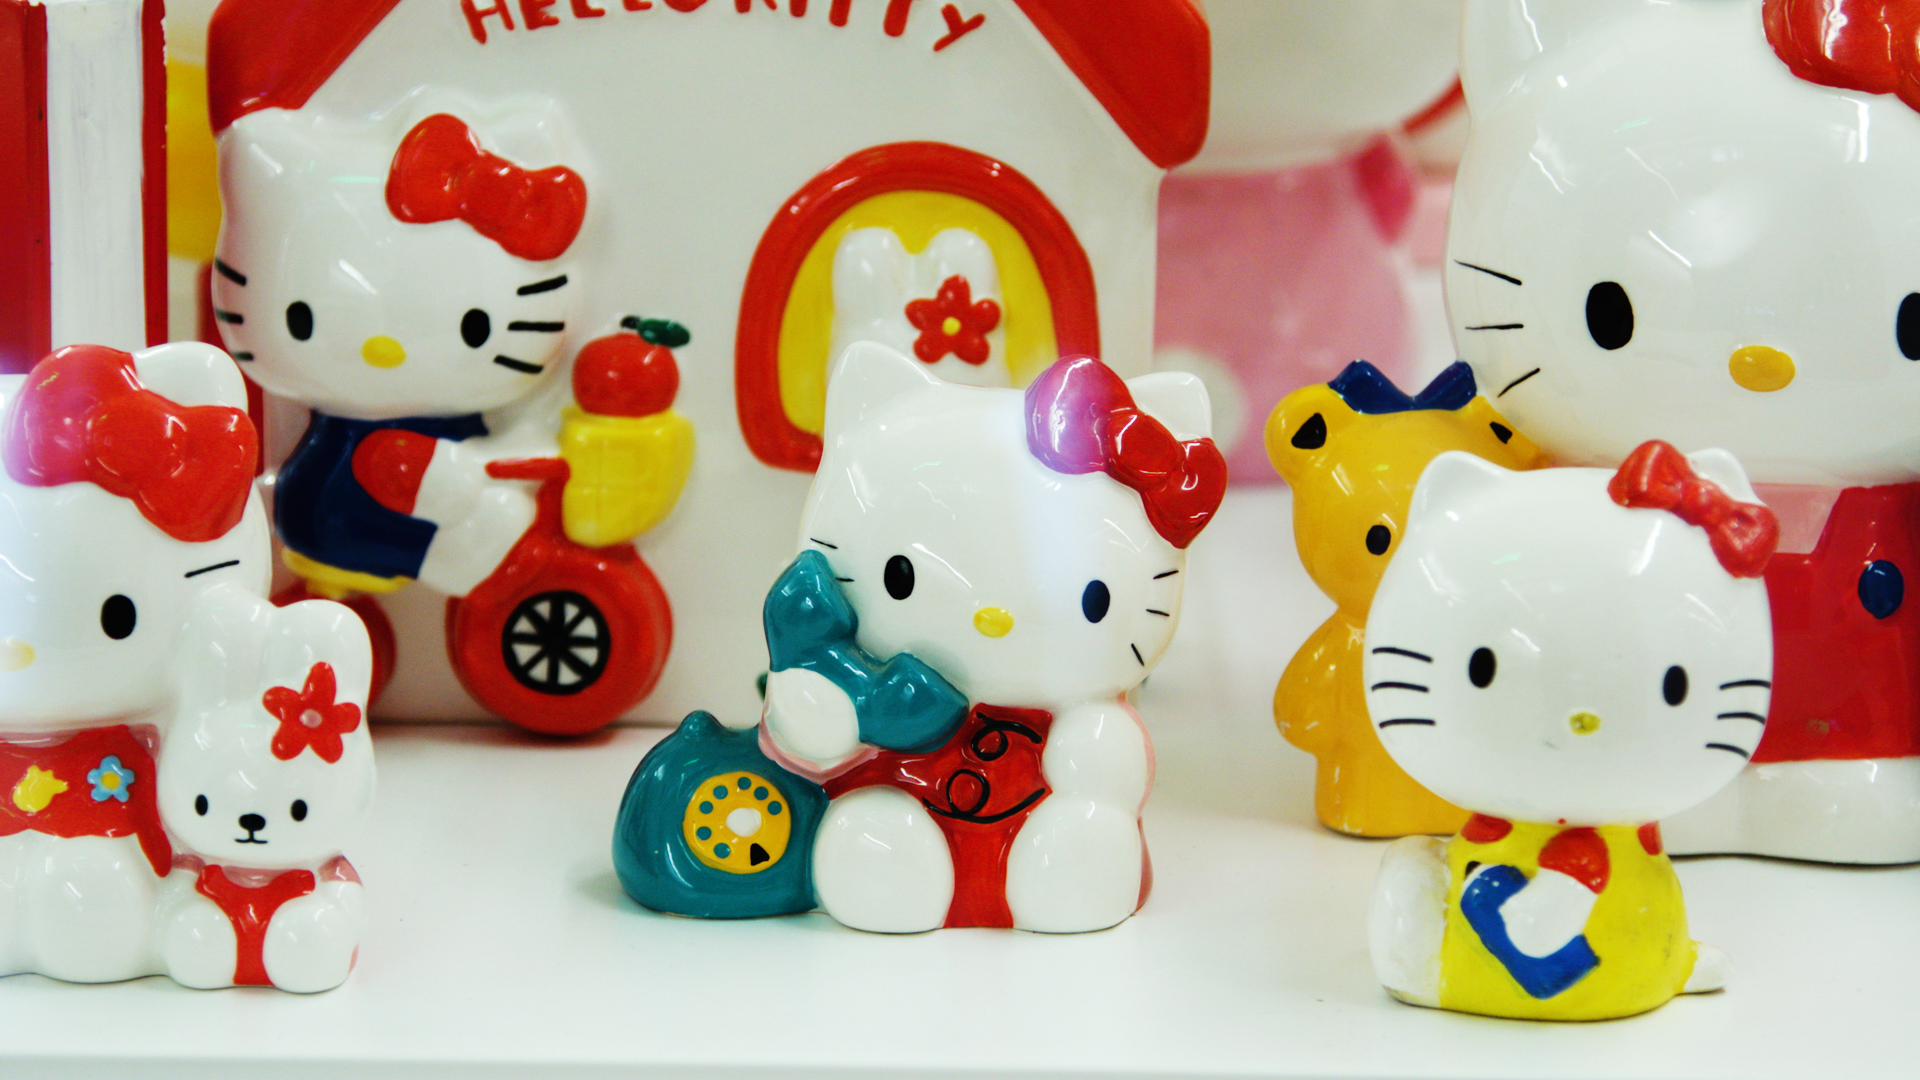 94754e605 Sanrio's Los Angeles offices: Take rare peek into Hello Kitty world | CNN  Travel